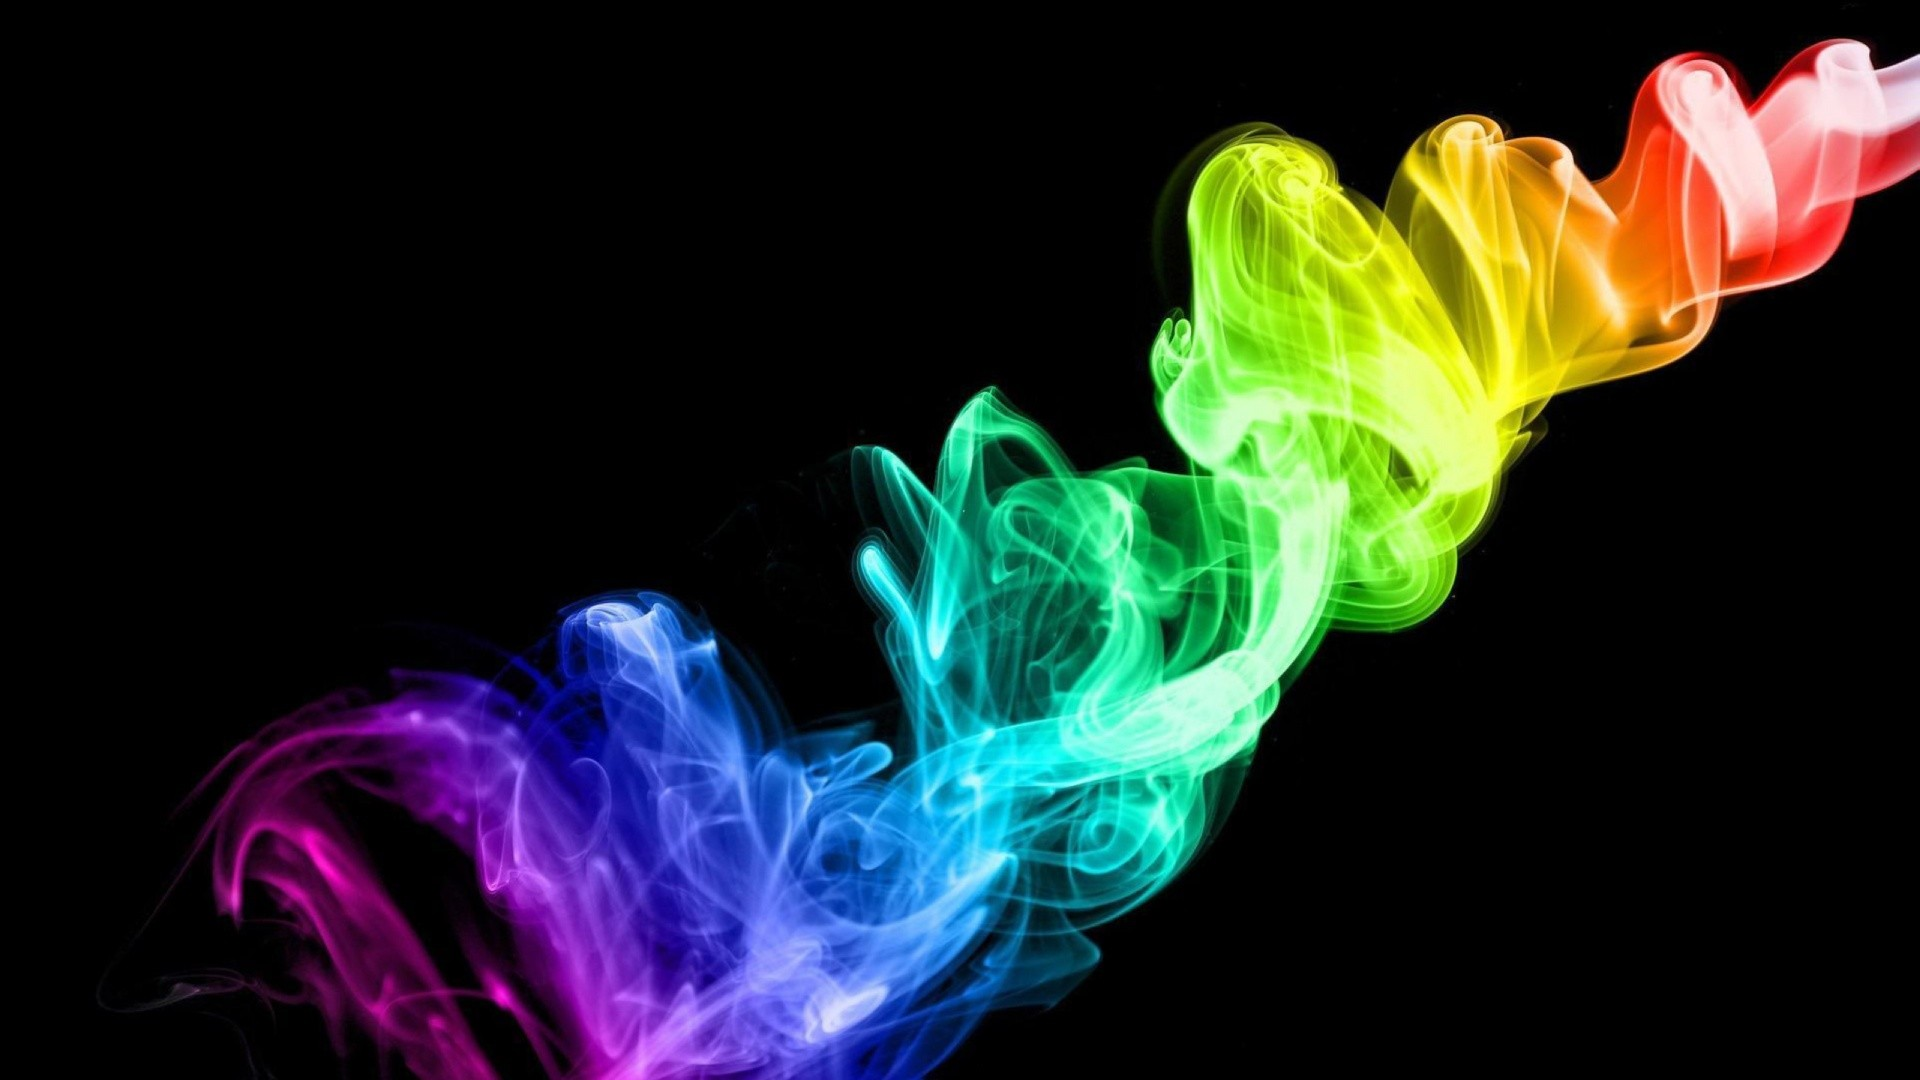 Trippy Wallpaper Iphone X Trippy Smoke Backgrounds Tumblr 183 ①